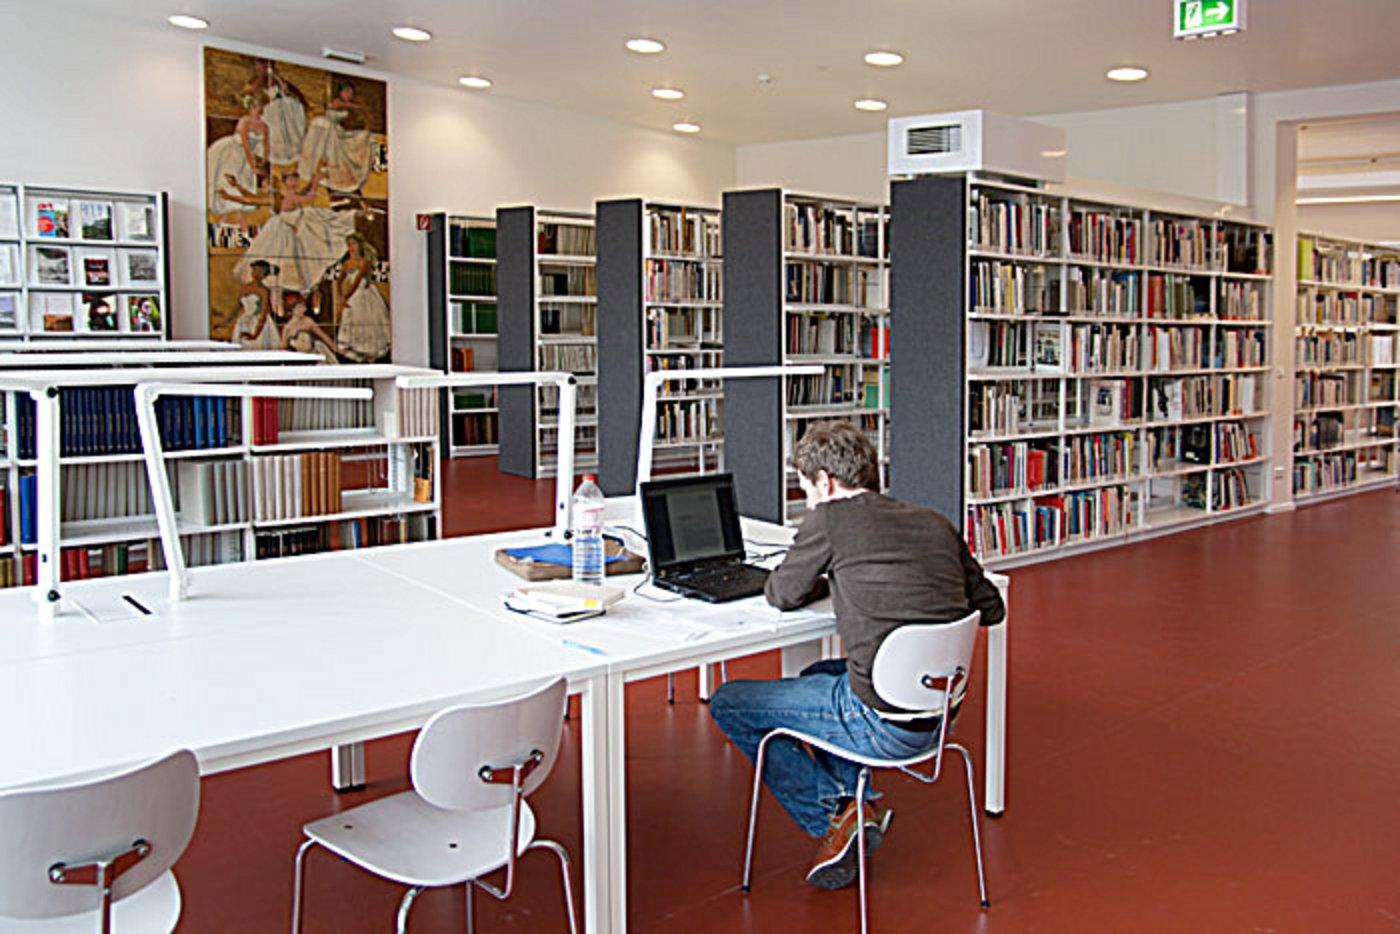 Bibliothek Stiftung Bauhaus Dessau Bauhaus Dessau Foundation